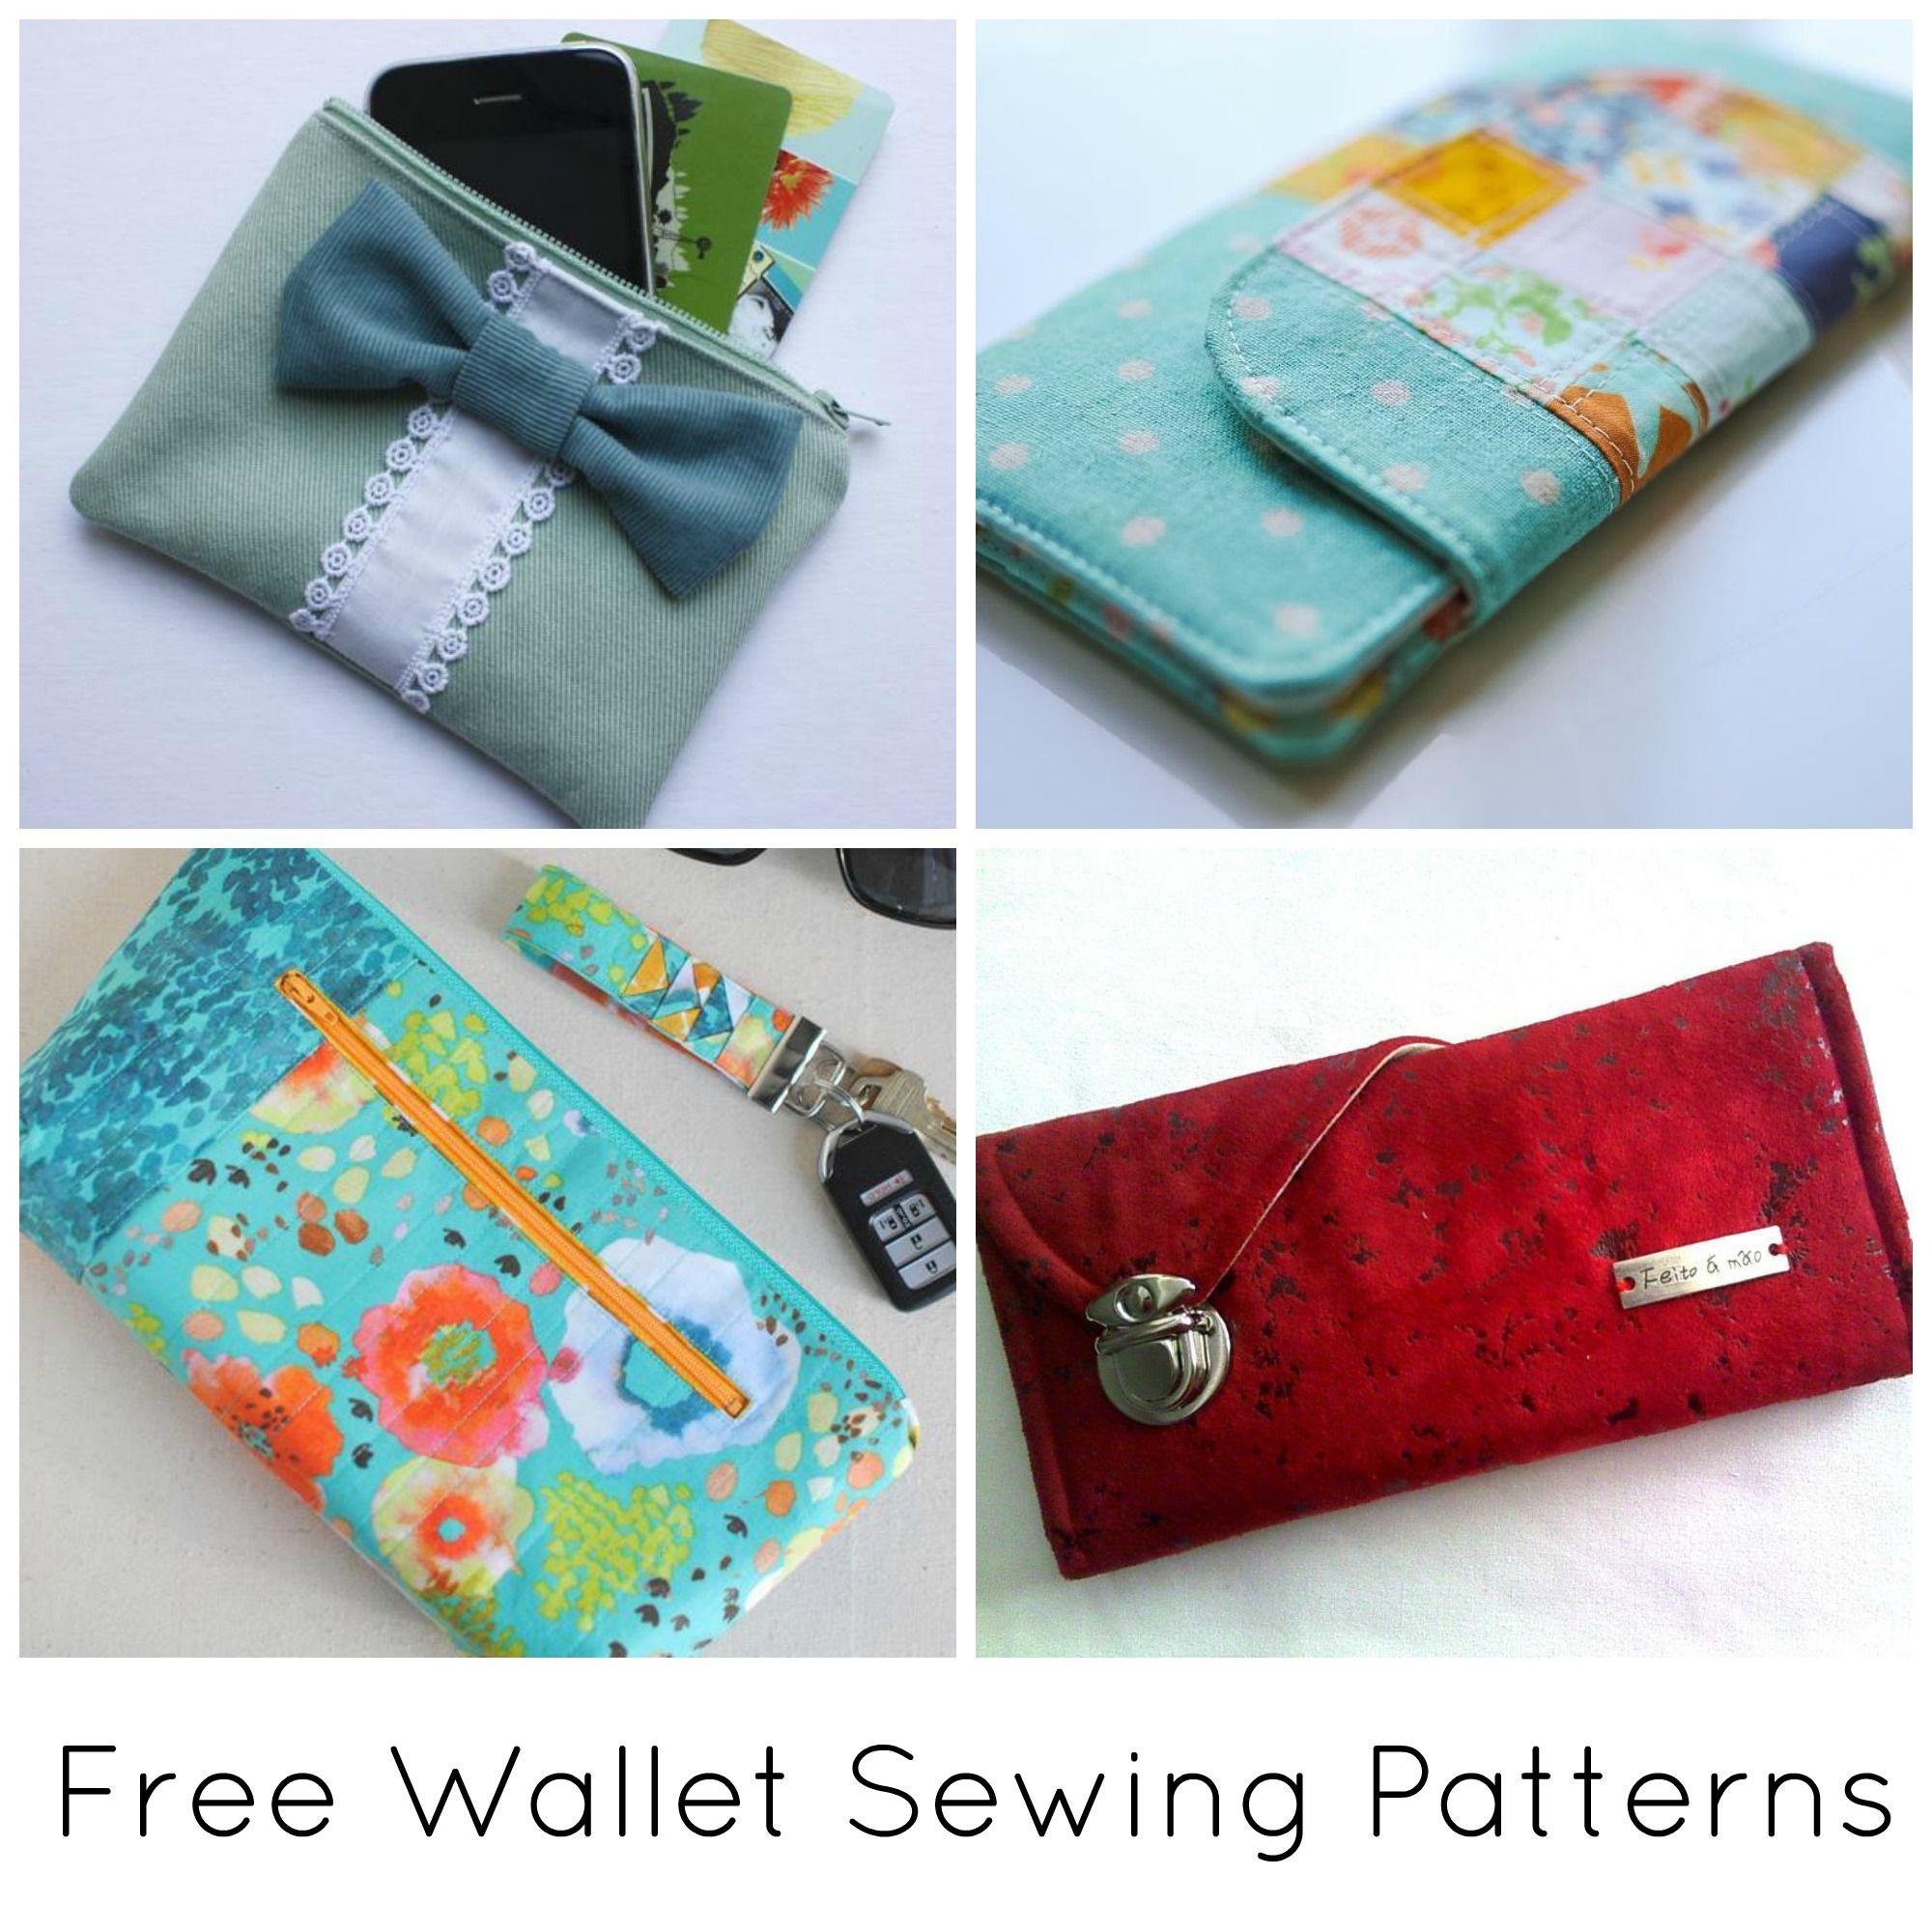 Free wallet sewing patterns to download wallet sewing pattern 11 free scrap friendly wallet sewing patterns jeuxipadfo Choice Image